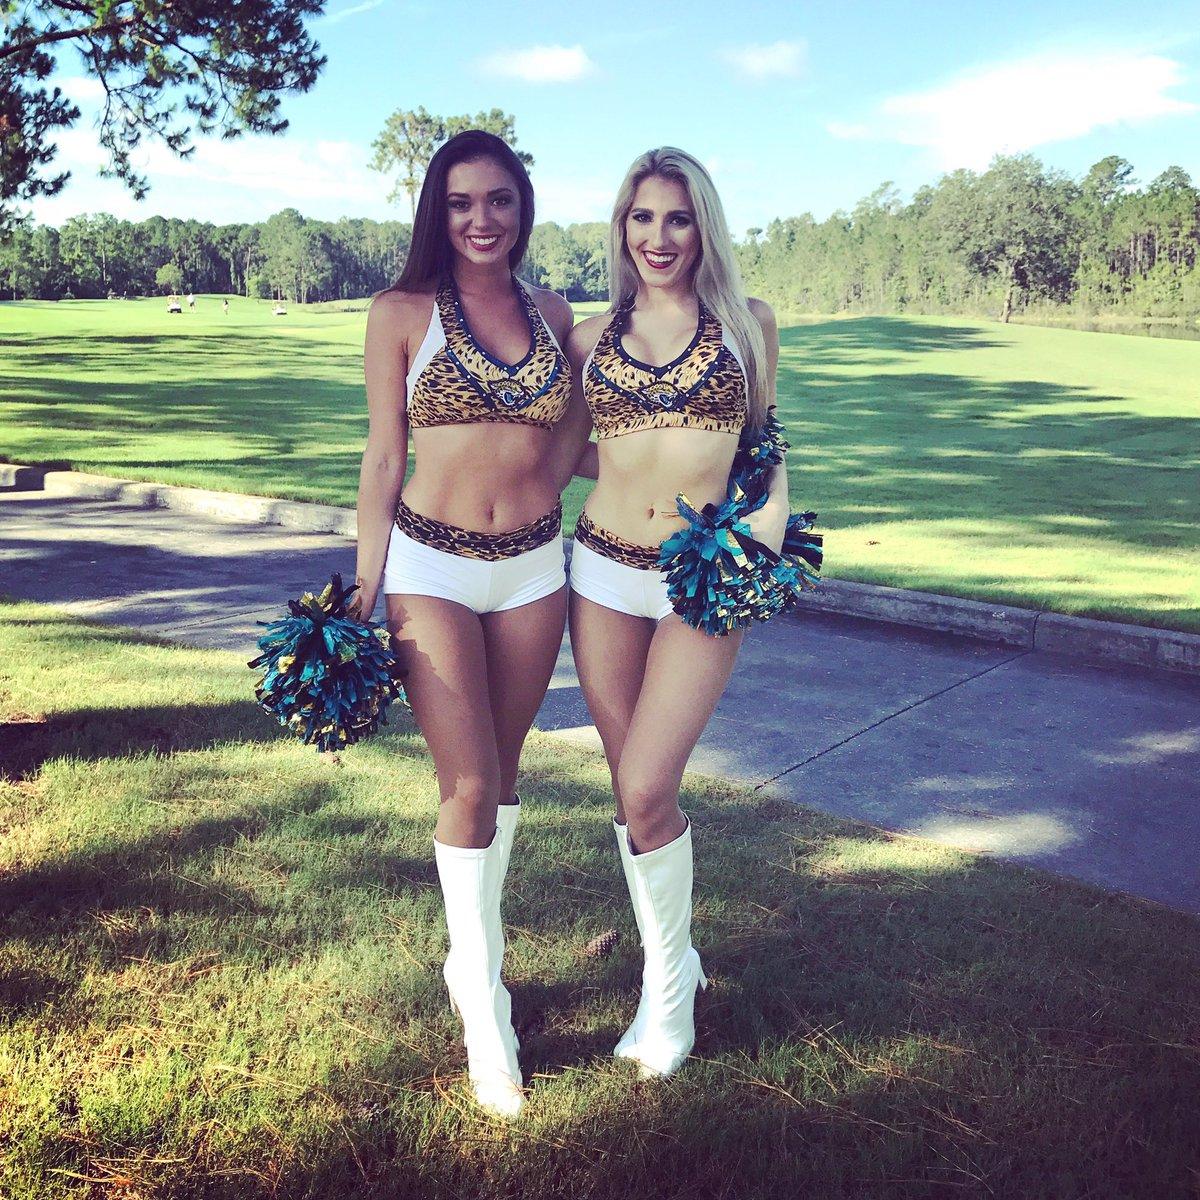 Next up on the tee at the #Jaguars Golf Classic, Rachel and Belinda.  #MOREROAR<br>http://pic.twitter.com/zVu4Jwmeso